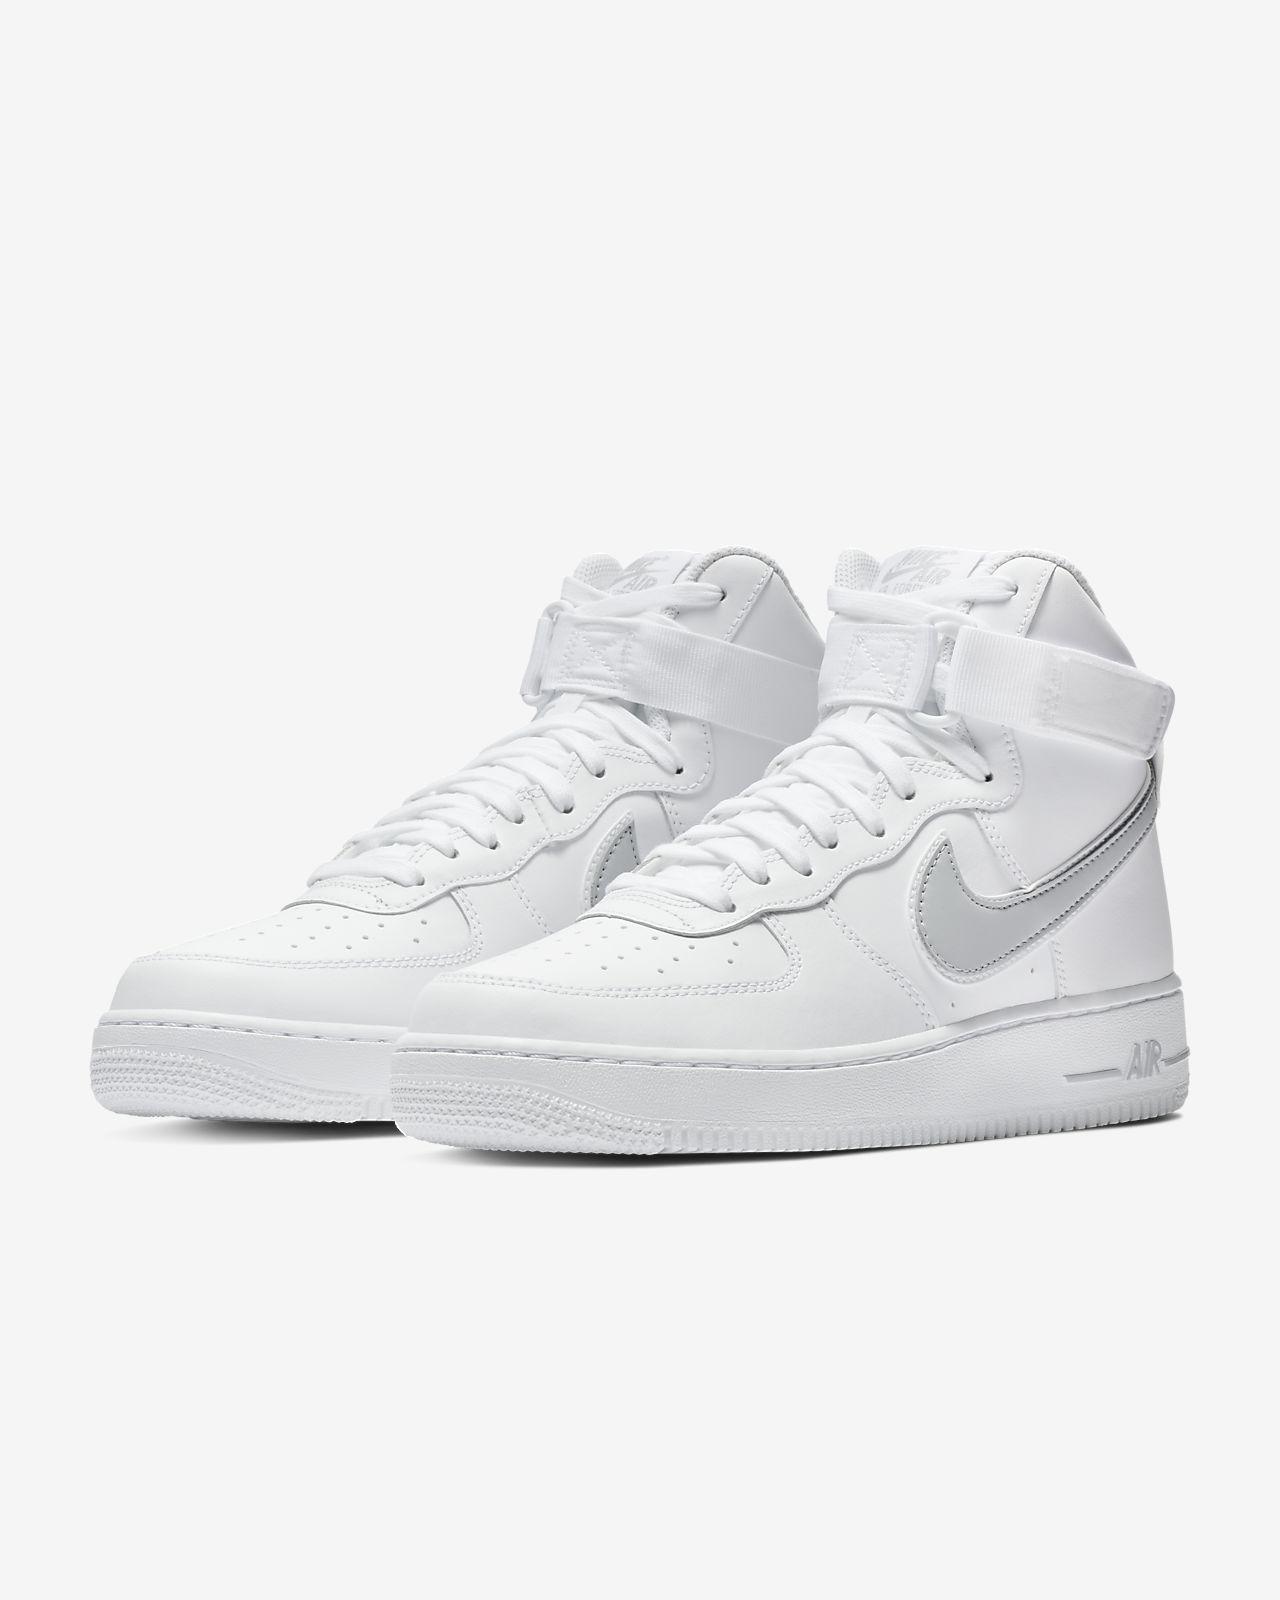 the latest 1c443 7e2d7 ... Nike Air Force 1 High  07 3 Men s Shoe